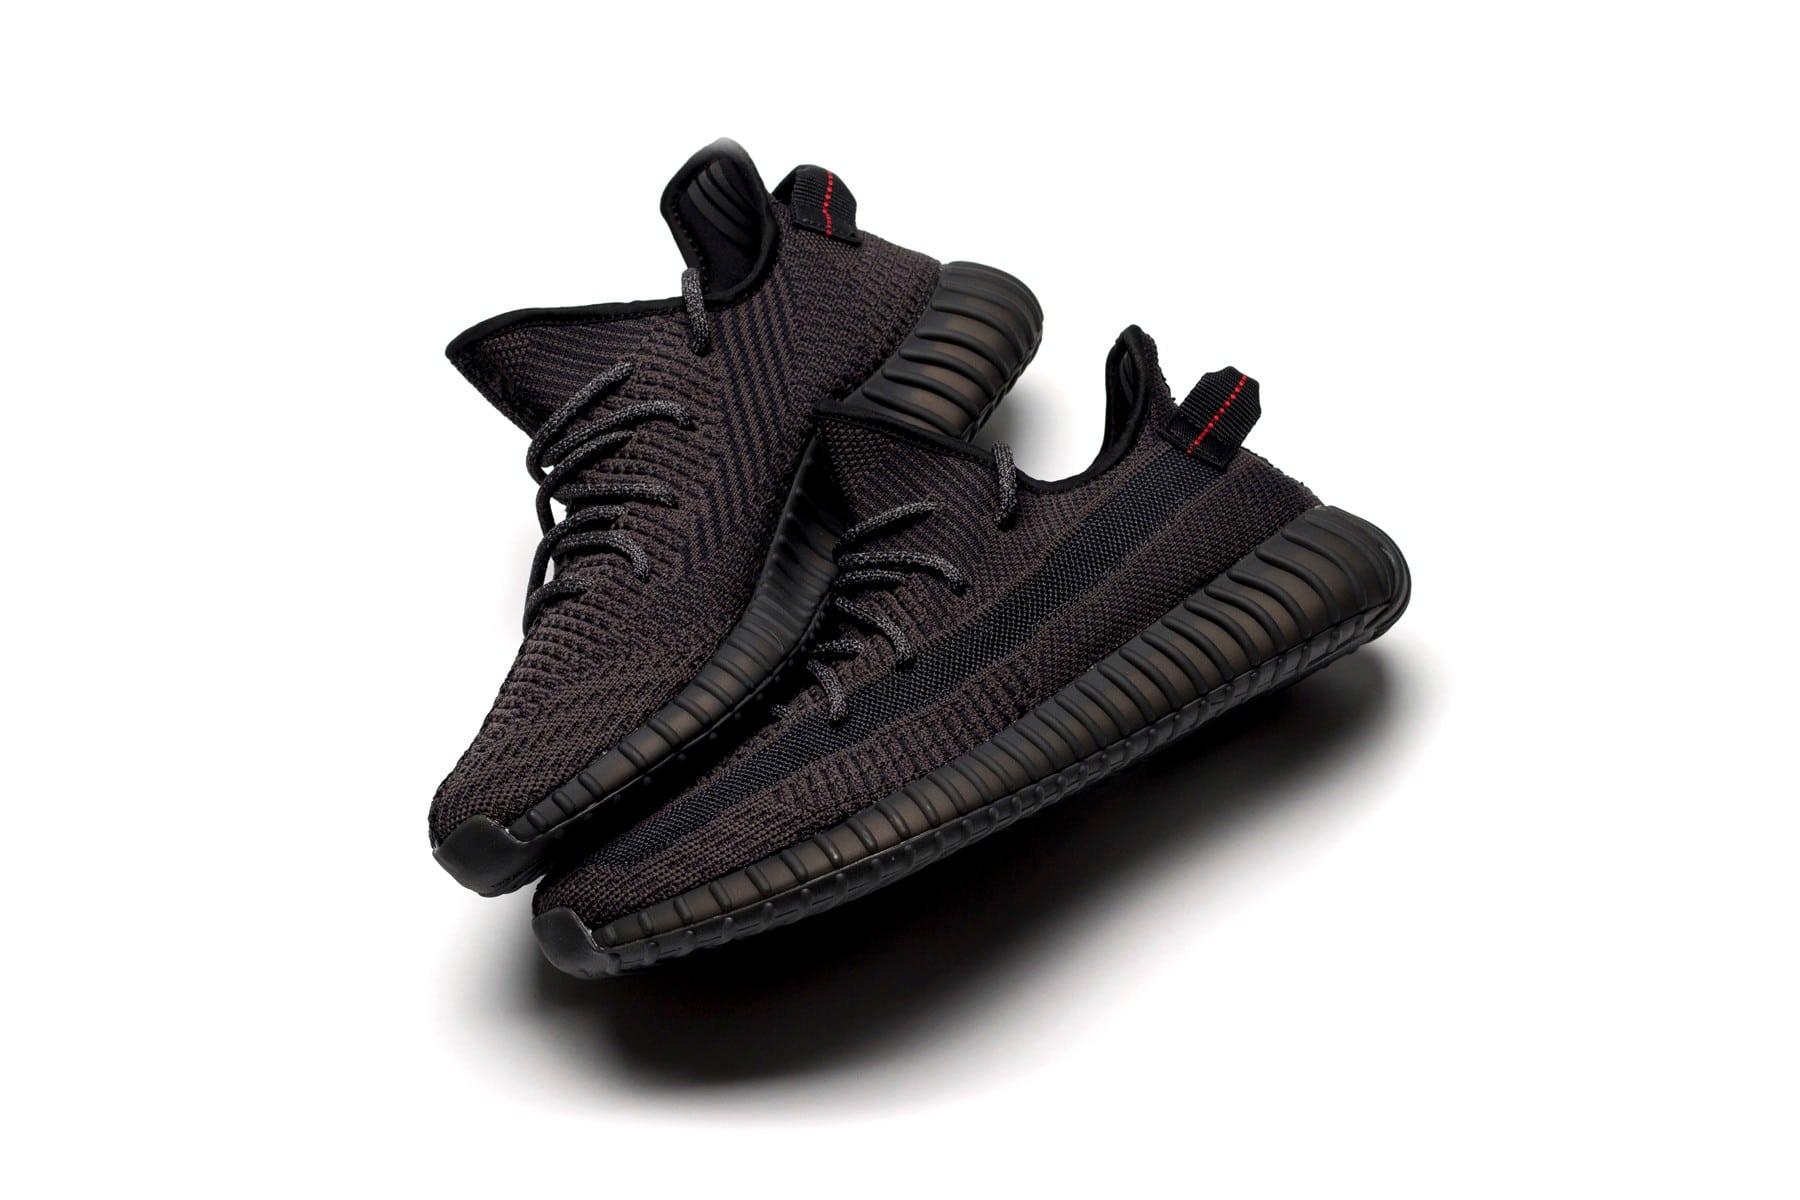 adidas YEEZY BOOST 350 V2 Black en Black Static release date